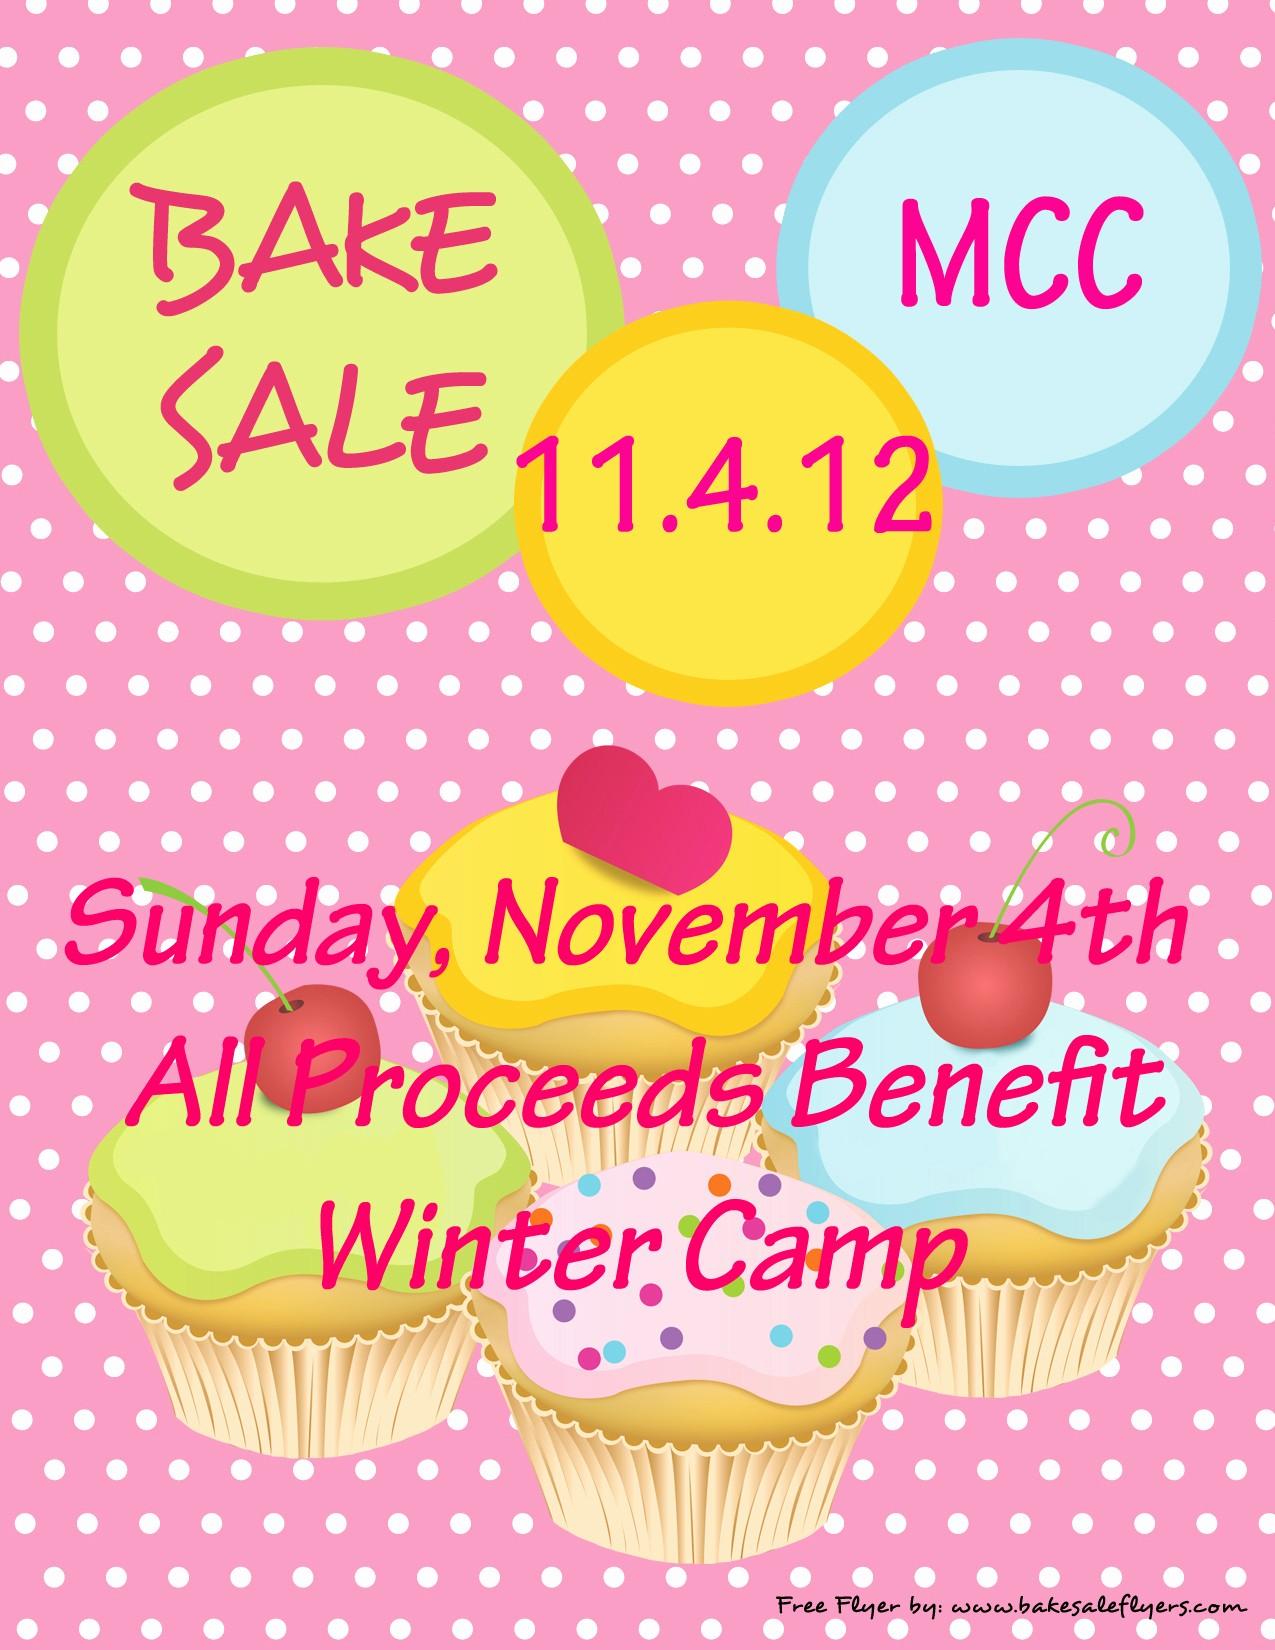 Bake Sale Flyer Template Free Unique Bake Sale Fundraiser